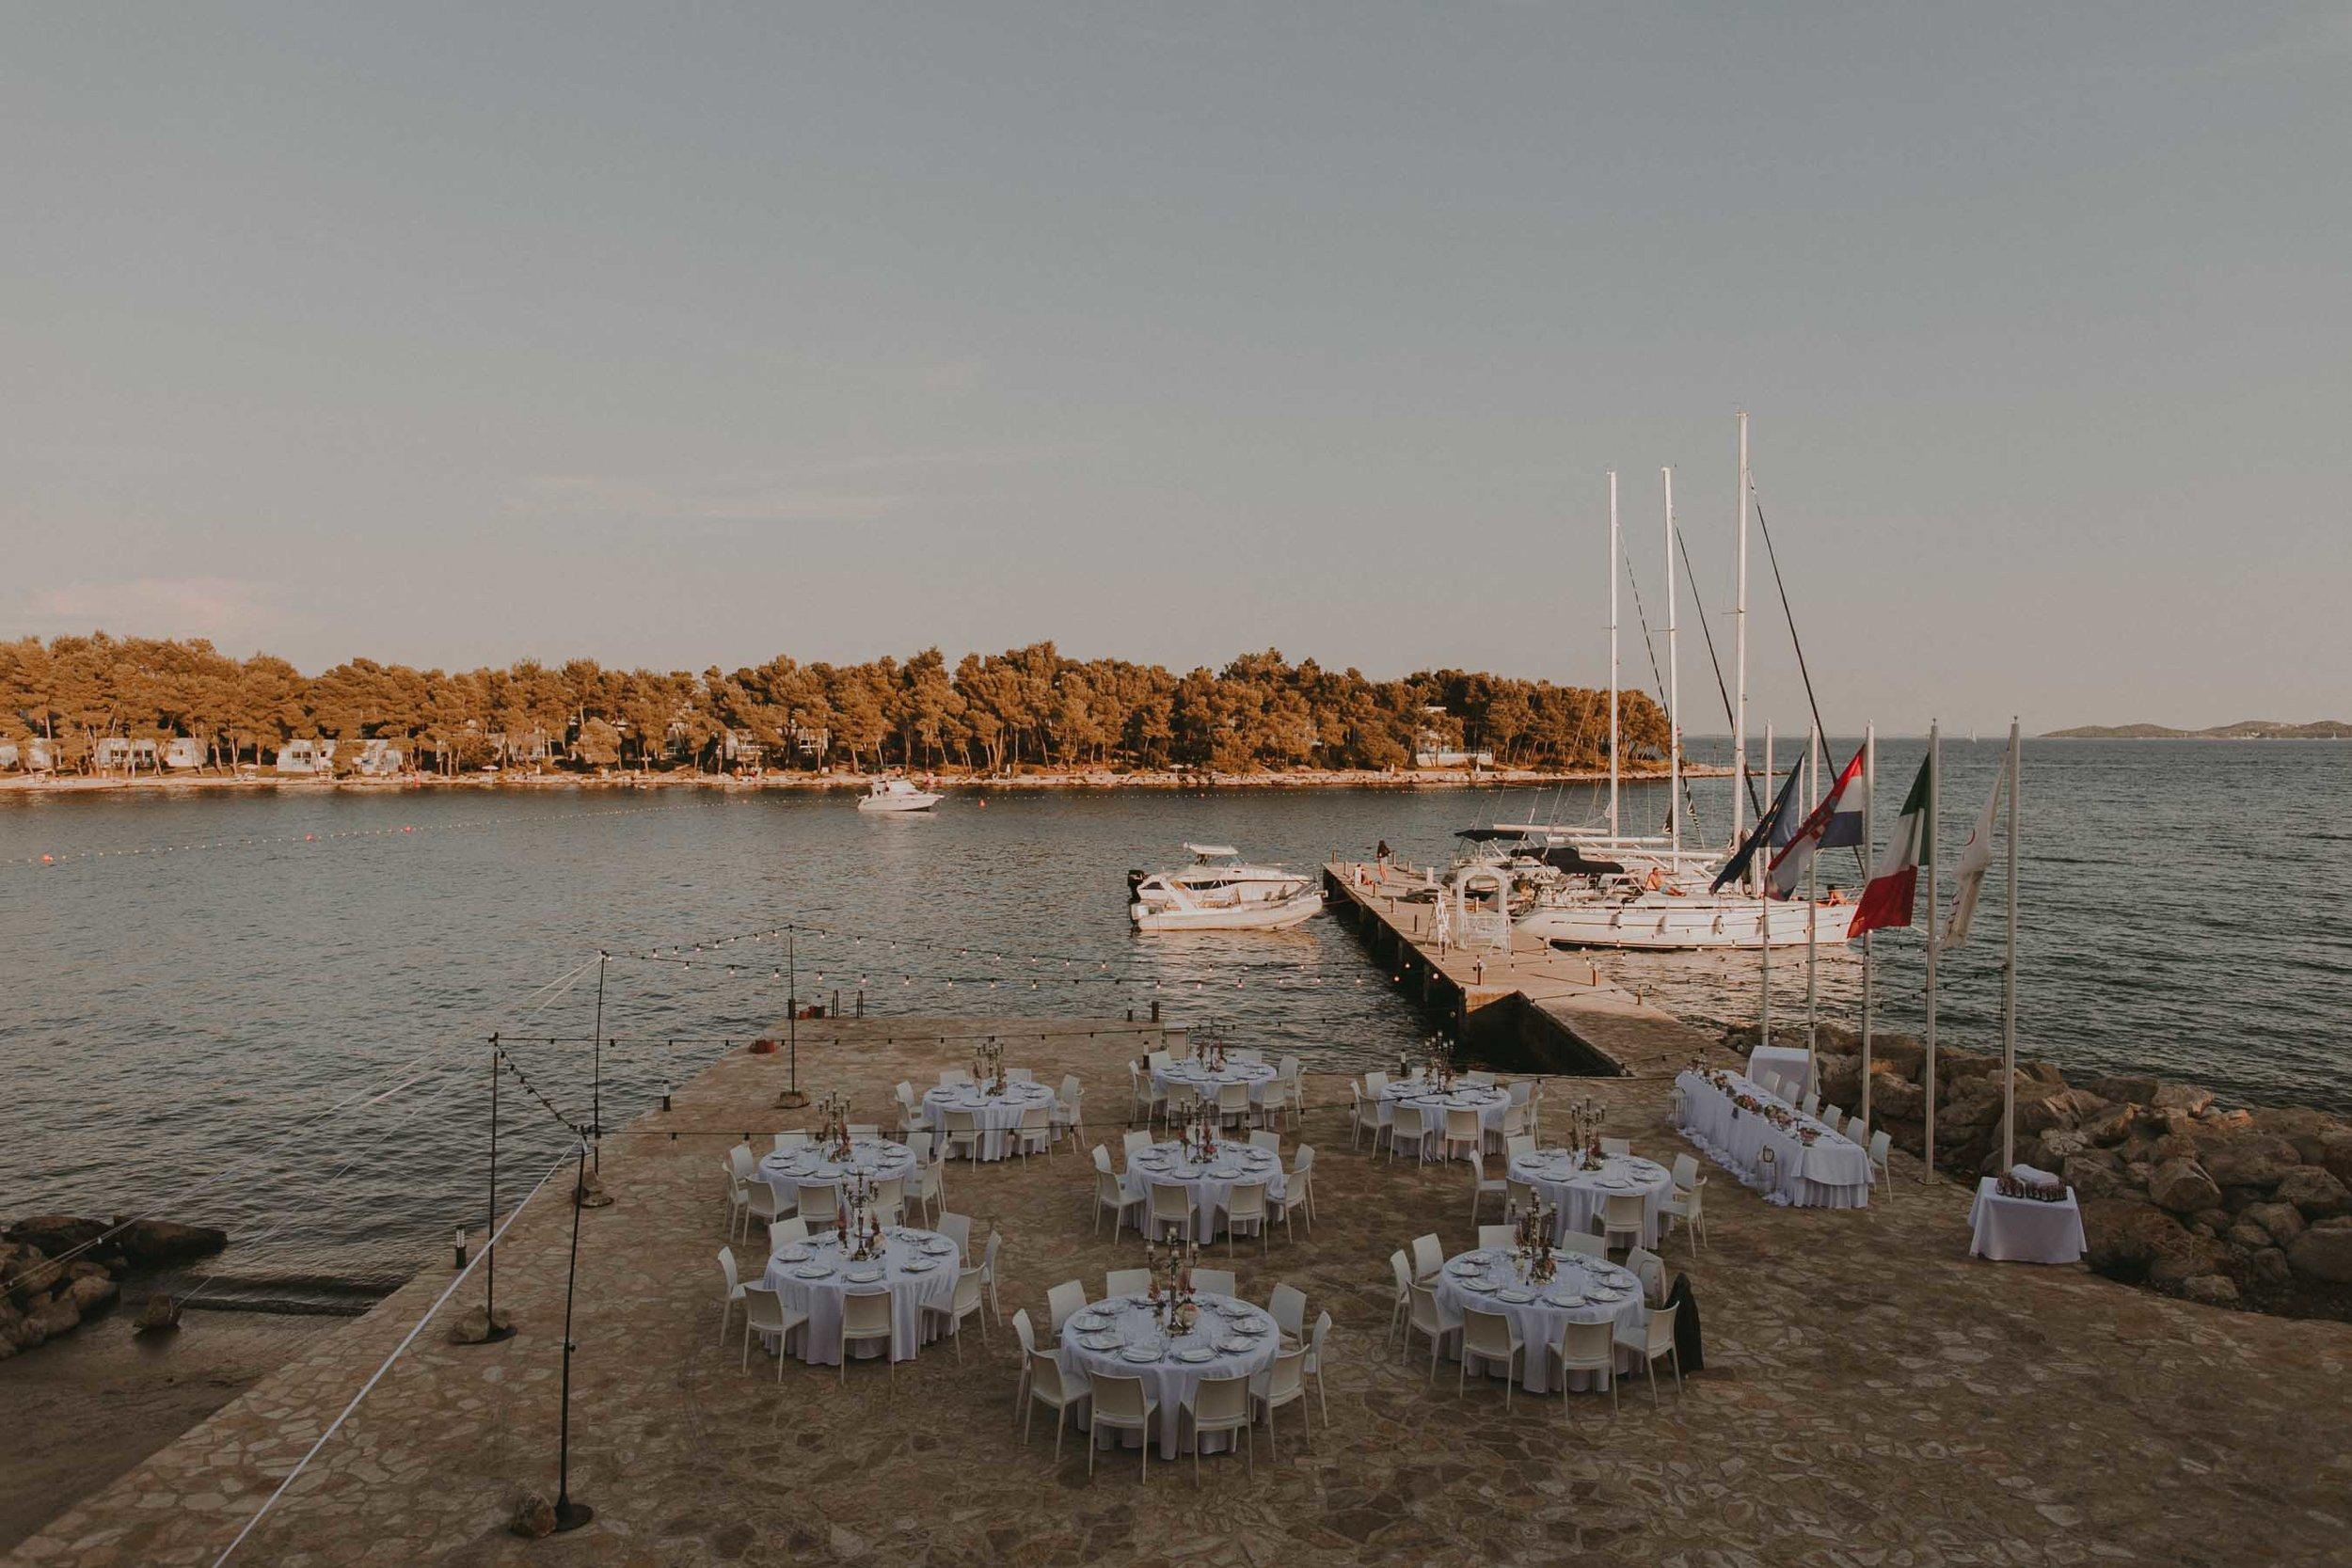 sylvia&dimitri-Wedding-Crvena_Luka-Croatia-37(6248).jpg